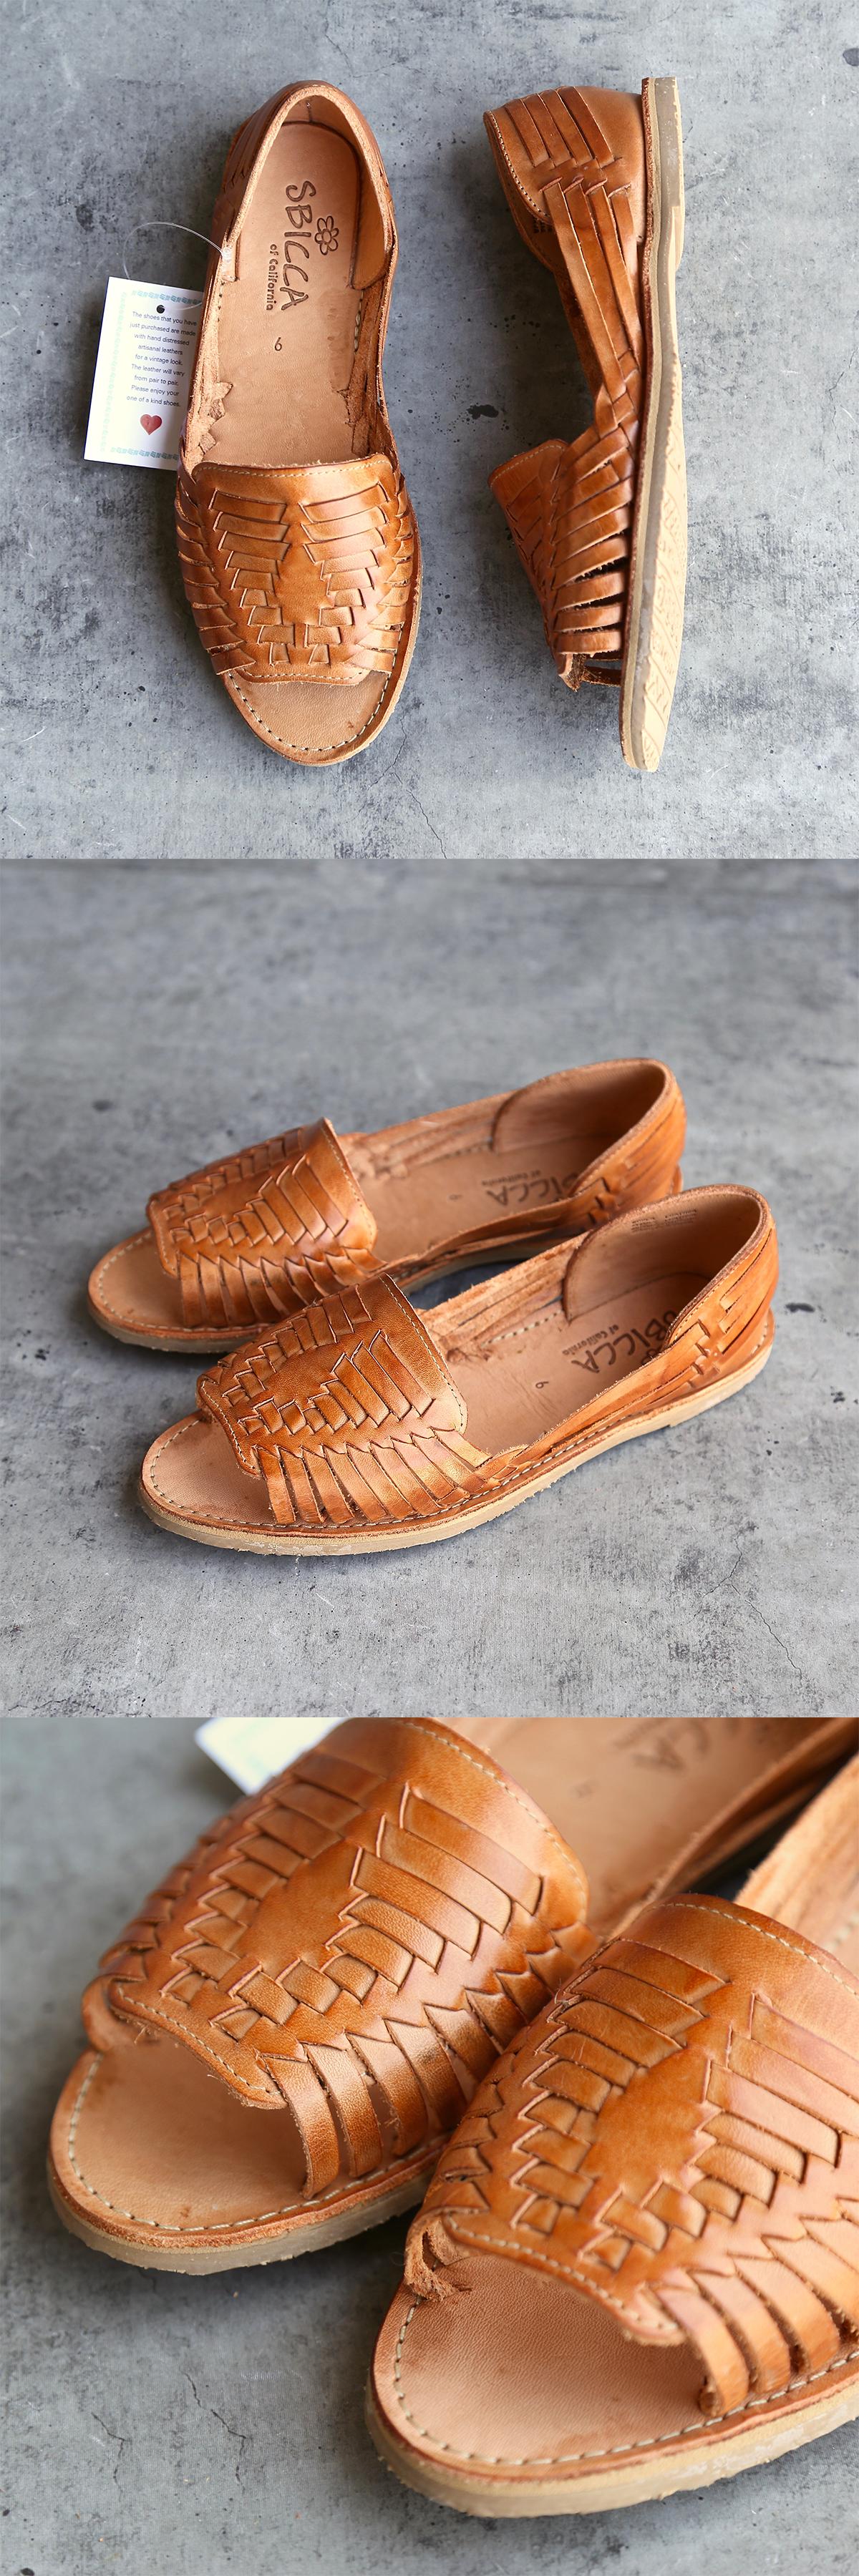 huarache sandals open toe